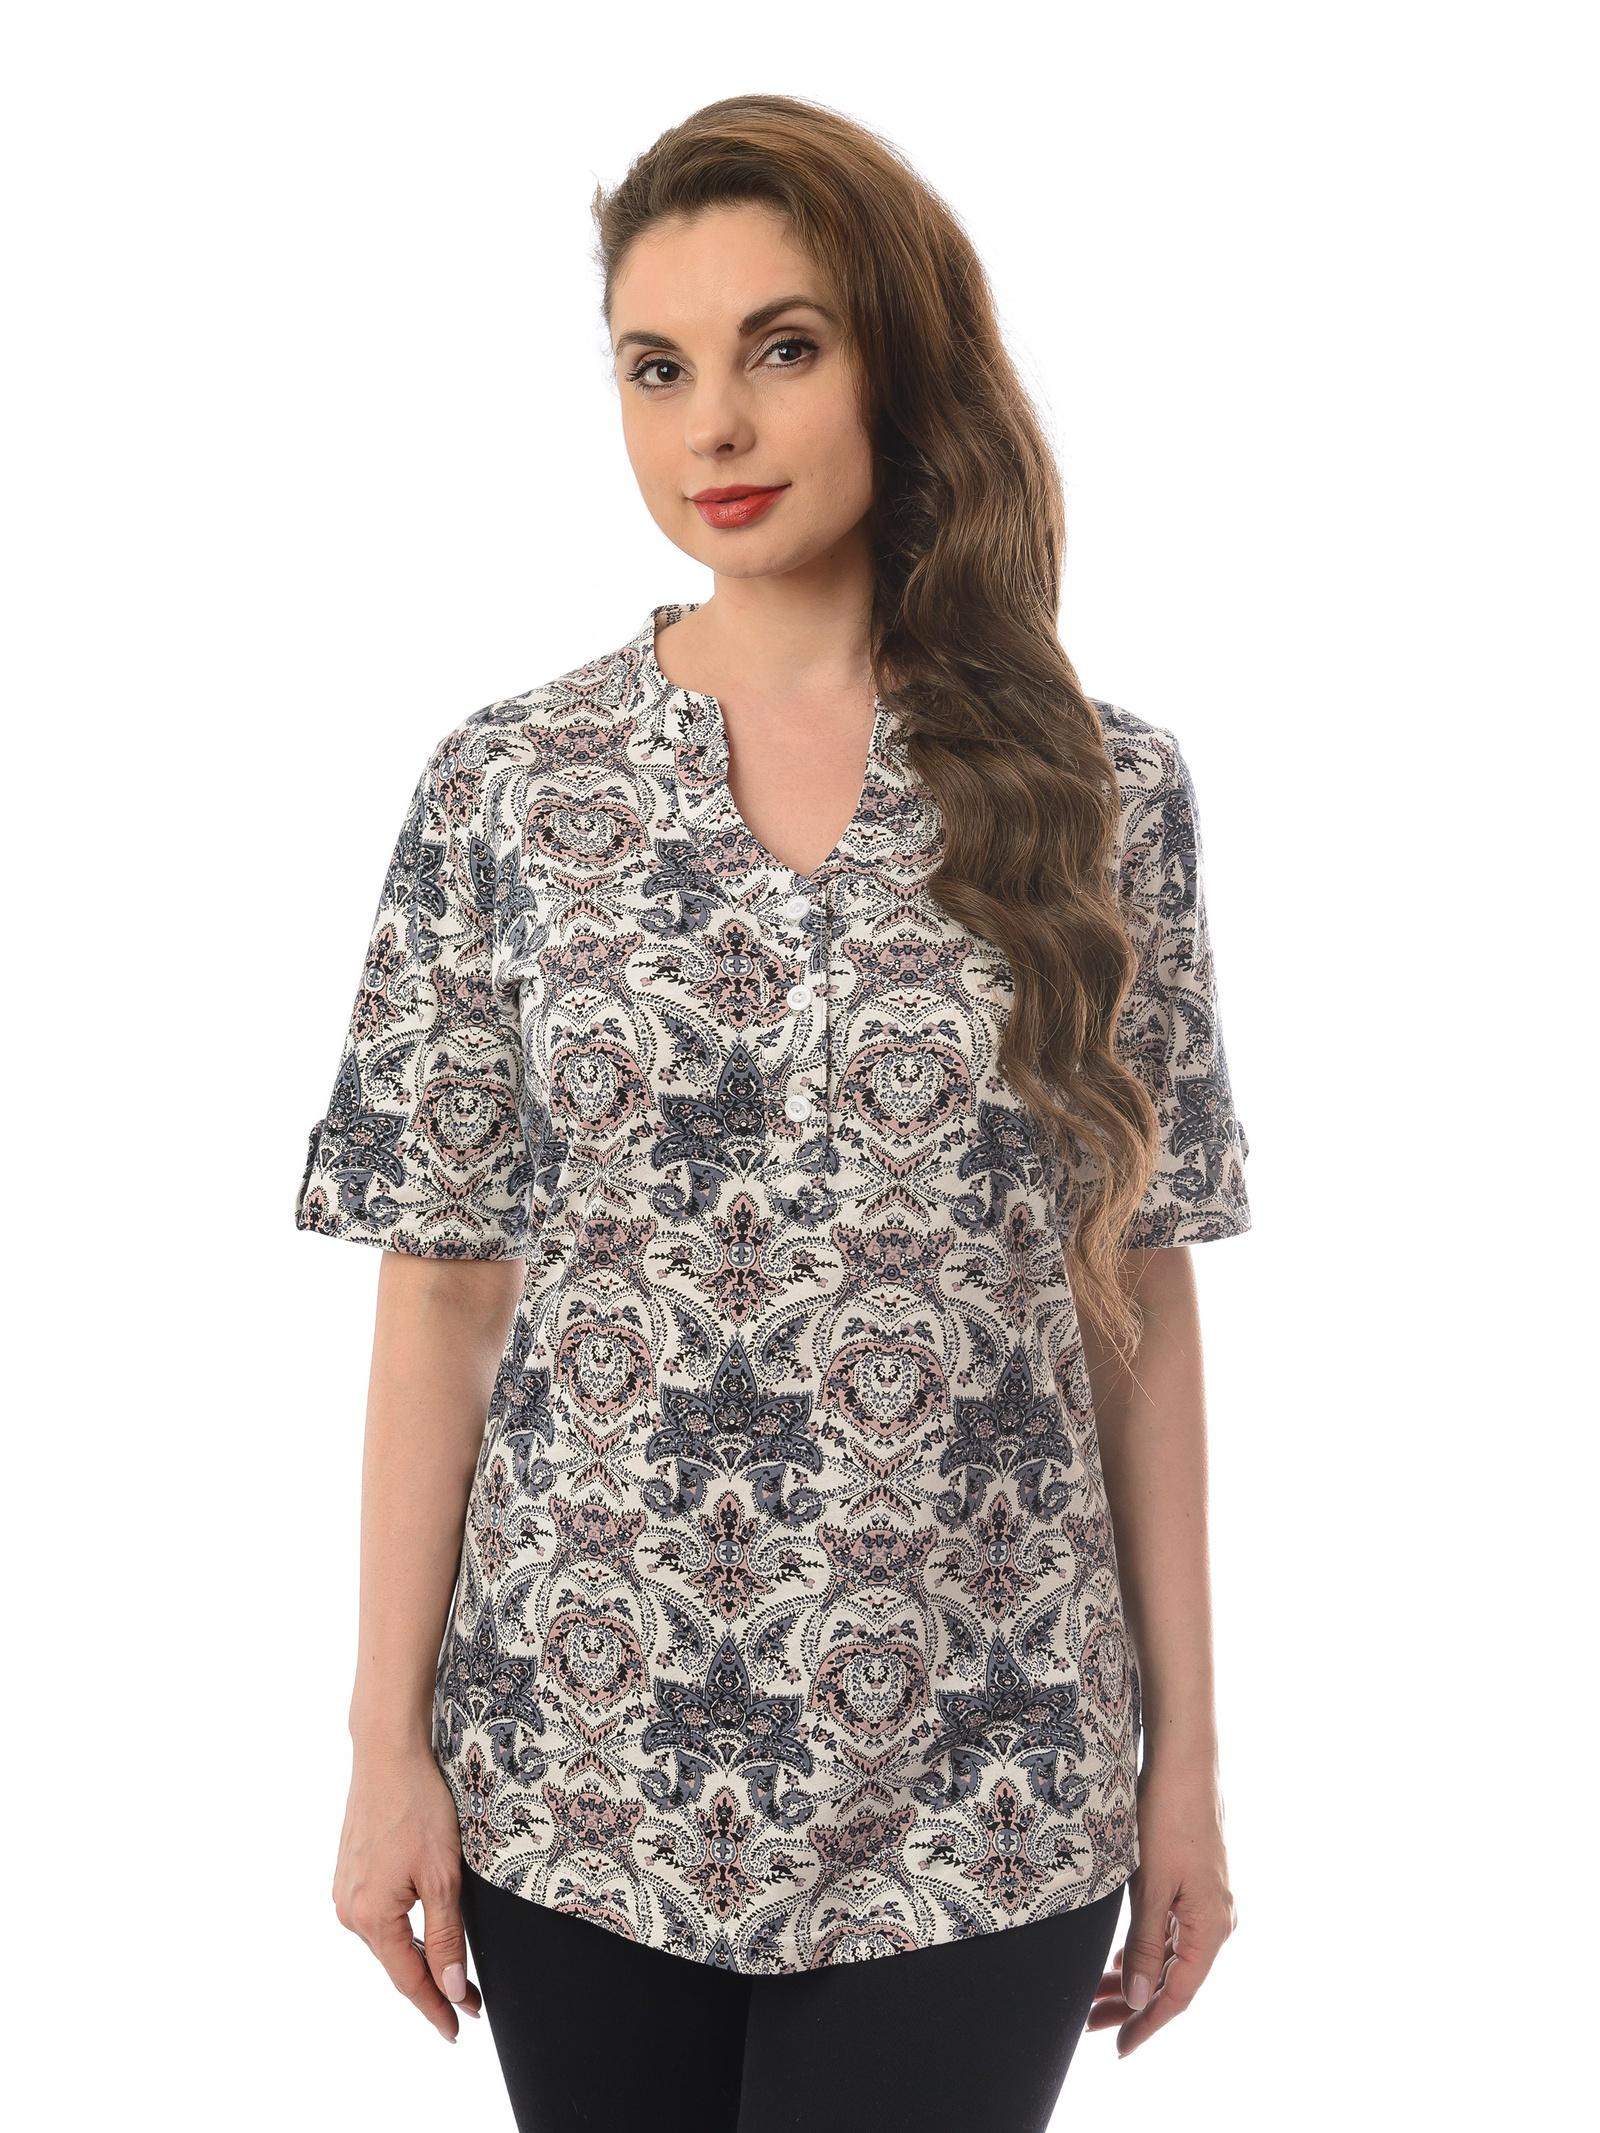 Блузка Алтекс блуза женская